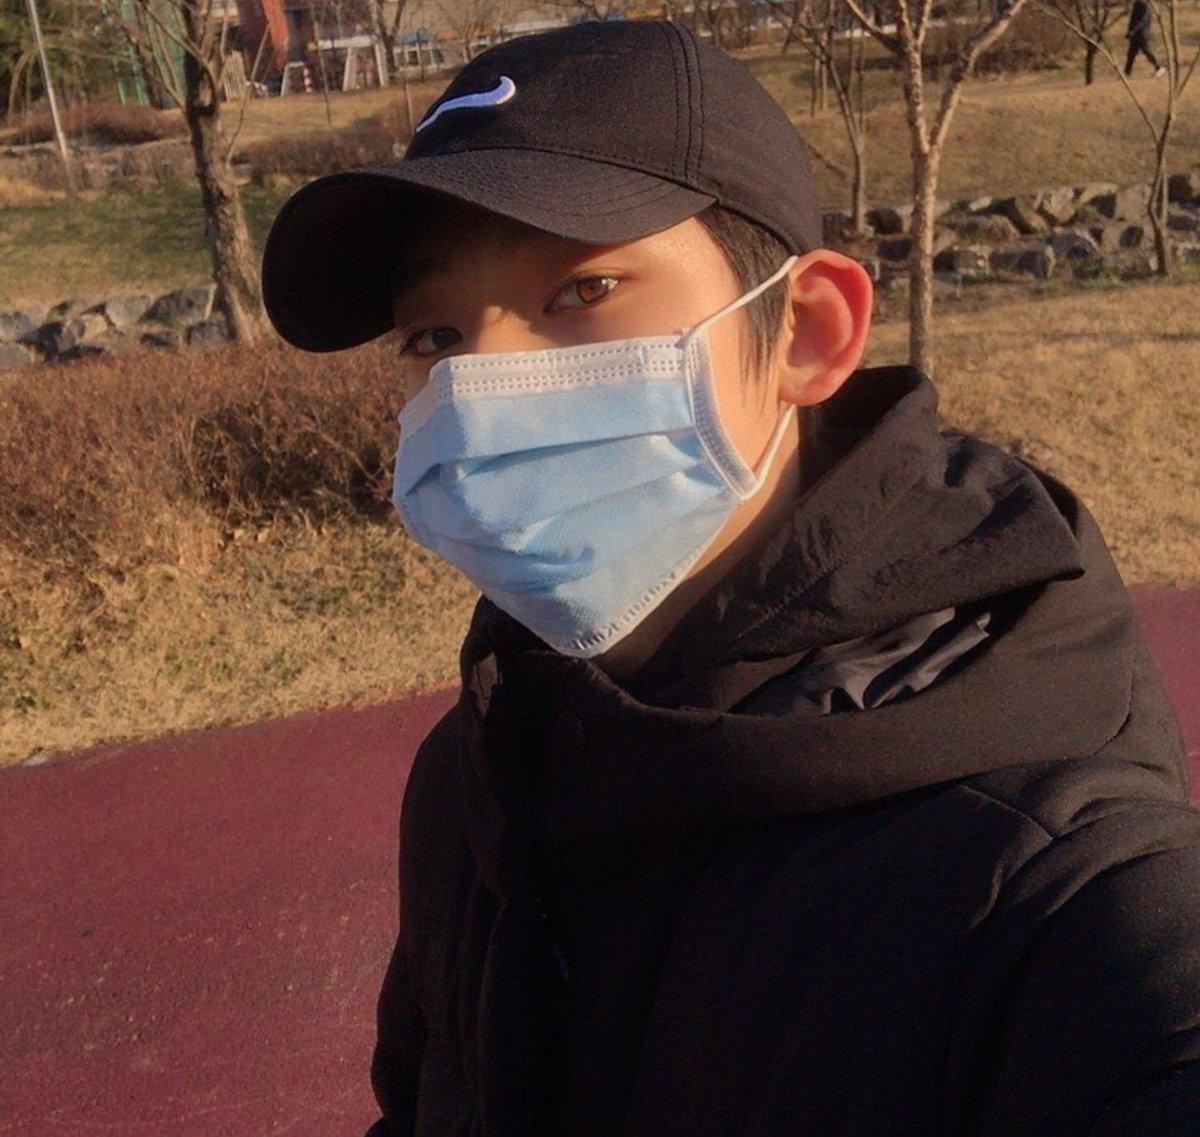 RT @ENHYPEN_members: 오랜만에 과거사진!! 엔진 잘자요 ✨😘 #ENHYPEN #ENGENE #SUNOO #굿나잇 #과거사진 #고1때...